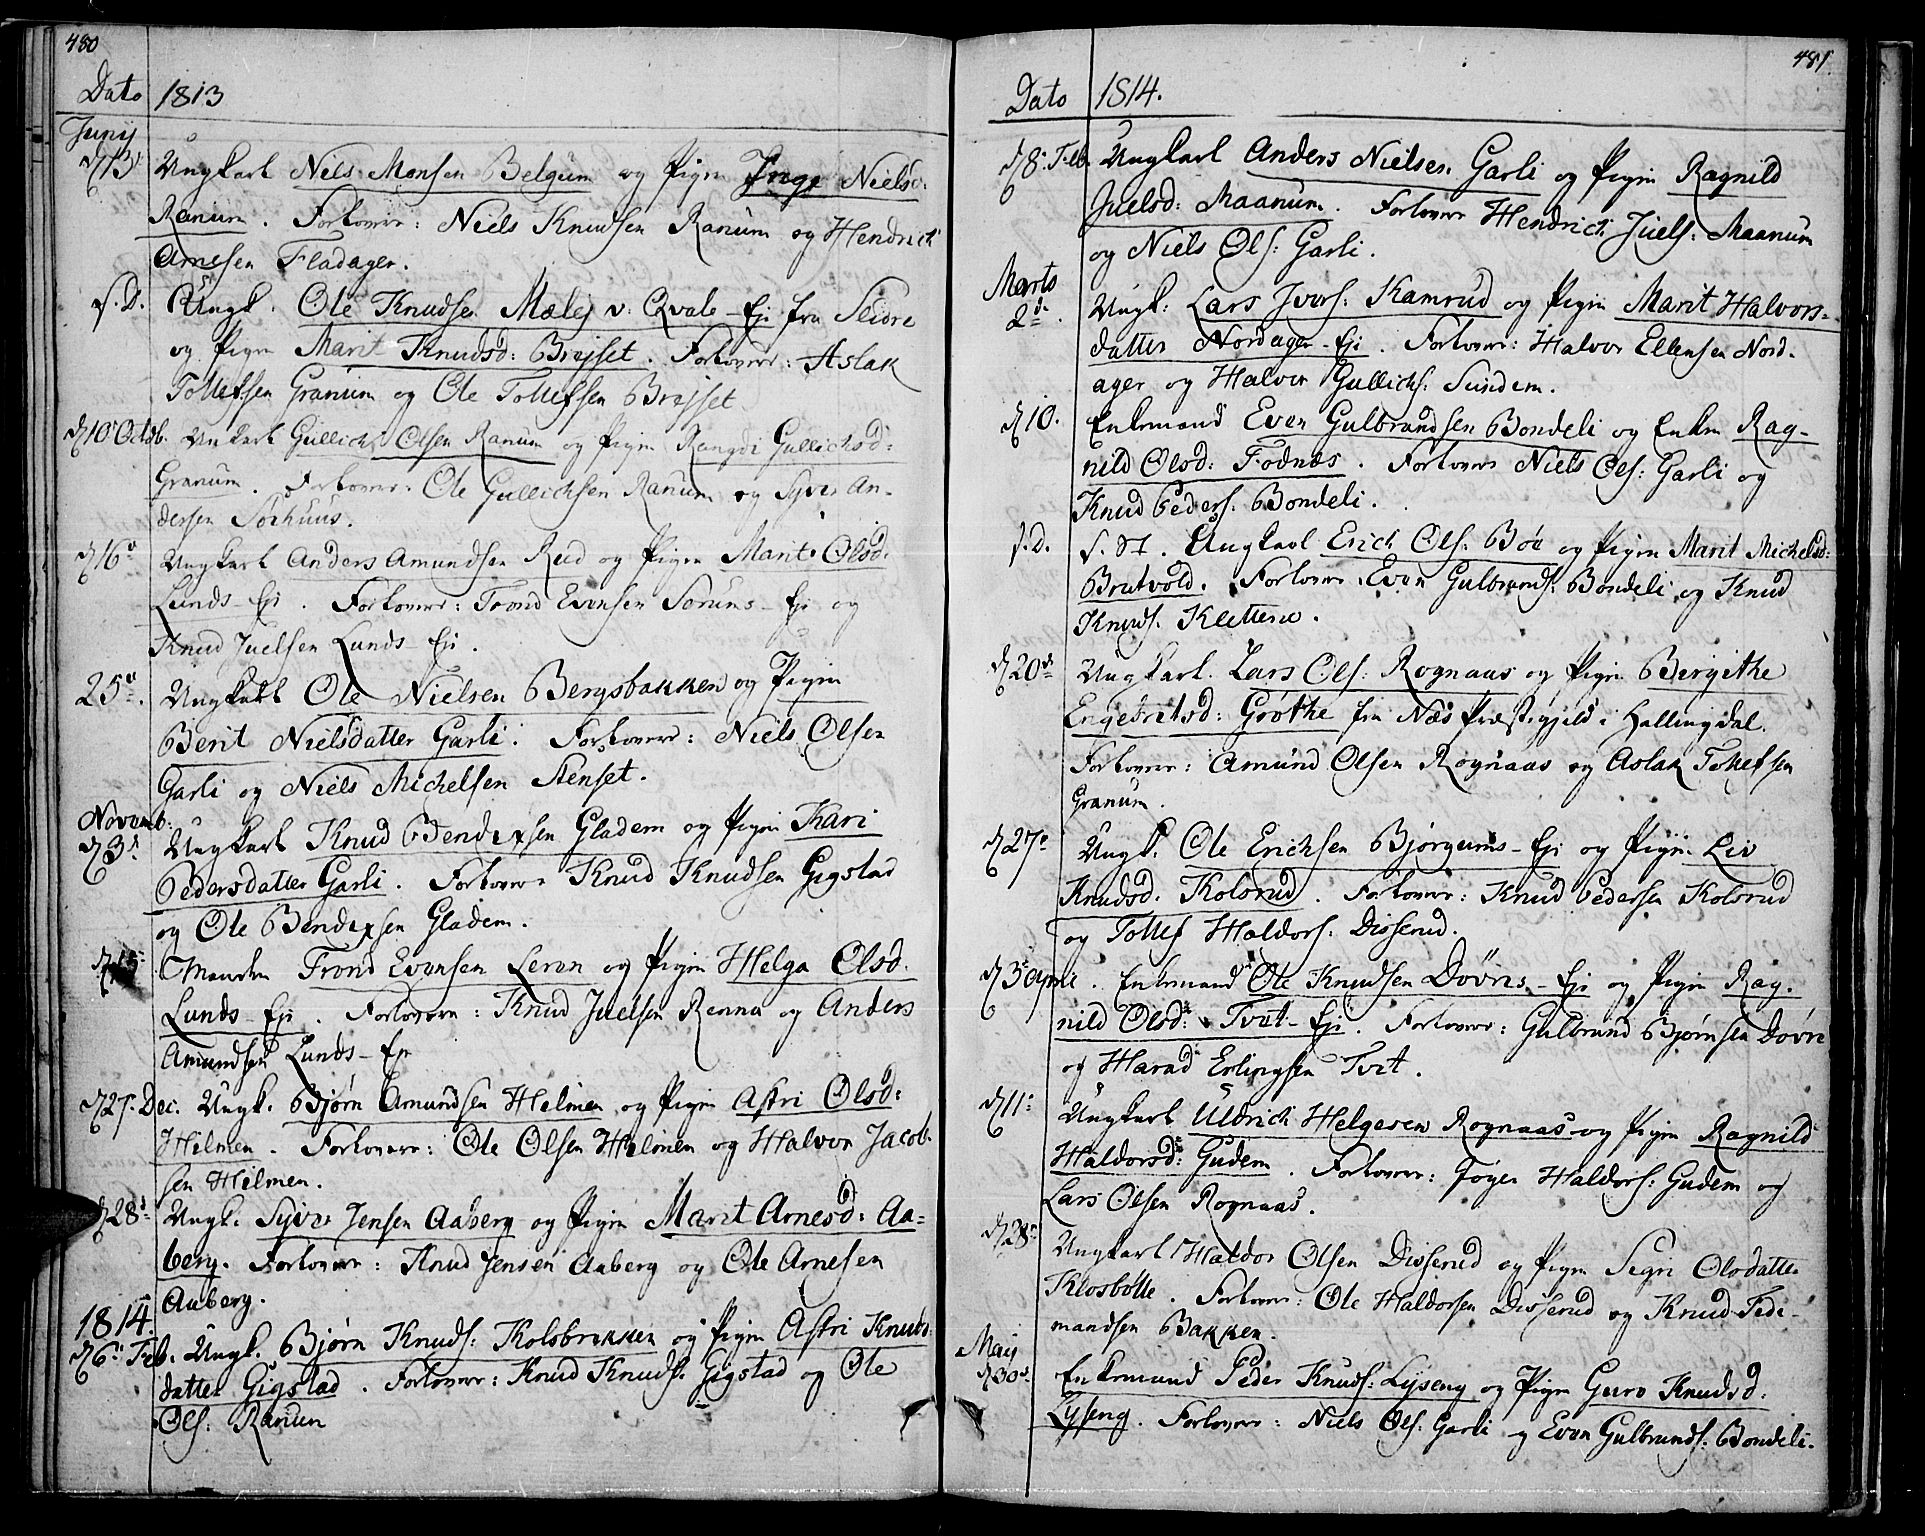 SAH, Nord-Aurdal prestekontor, Ministerialbok nr. 1, 1808-1815, s. 480-481